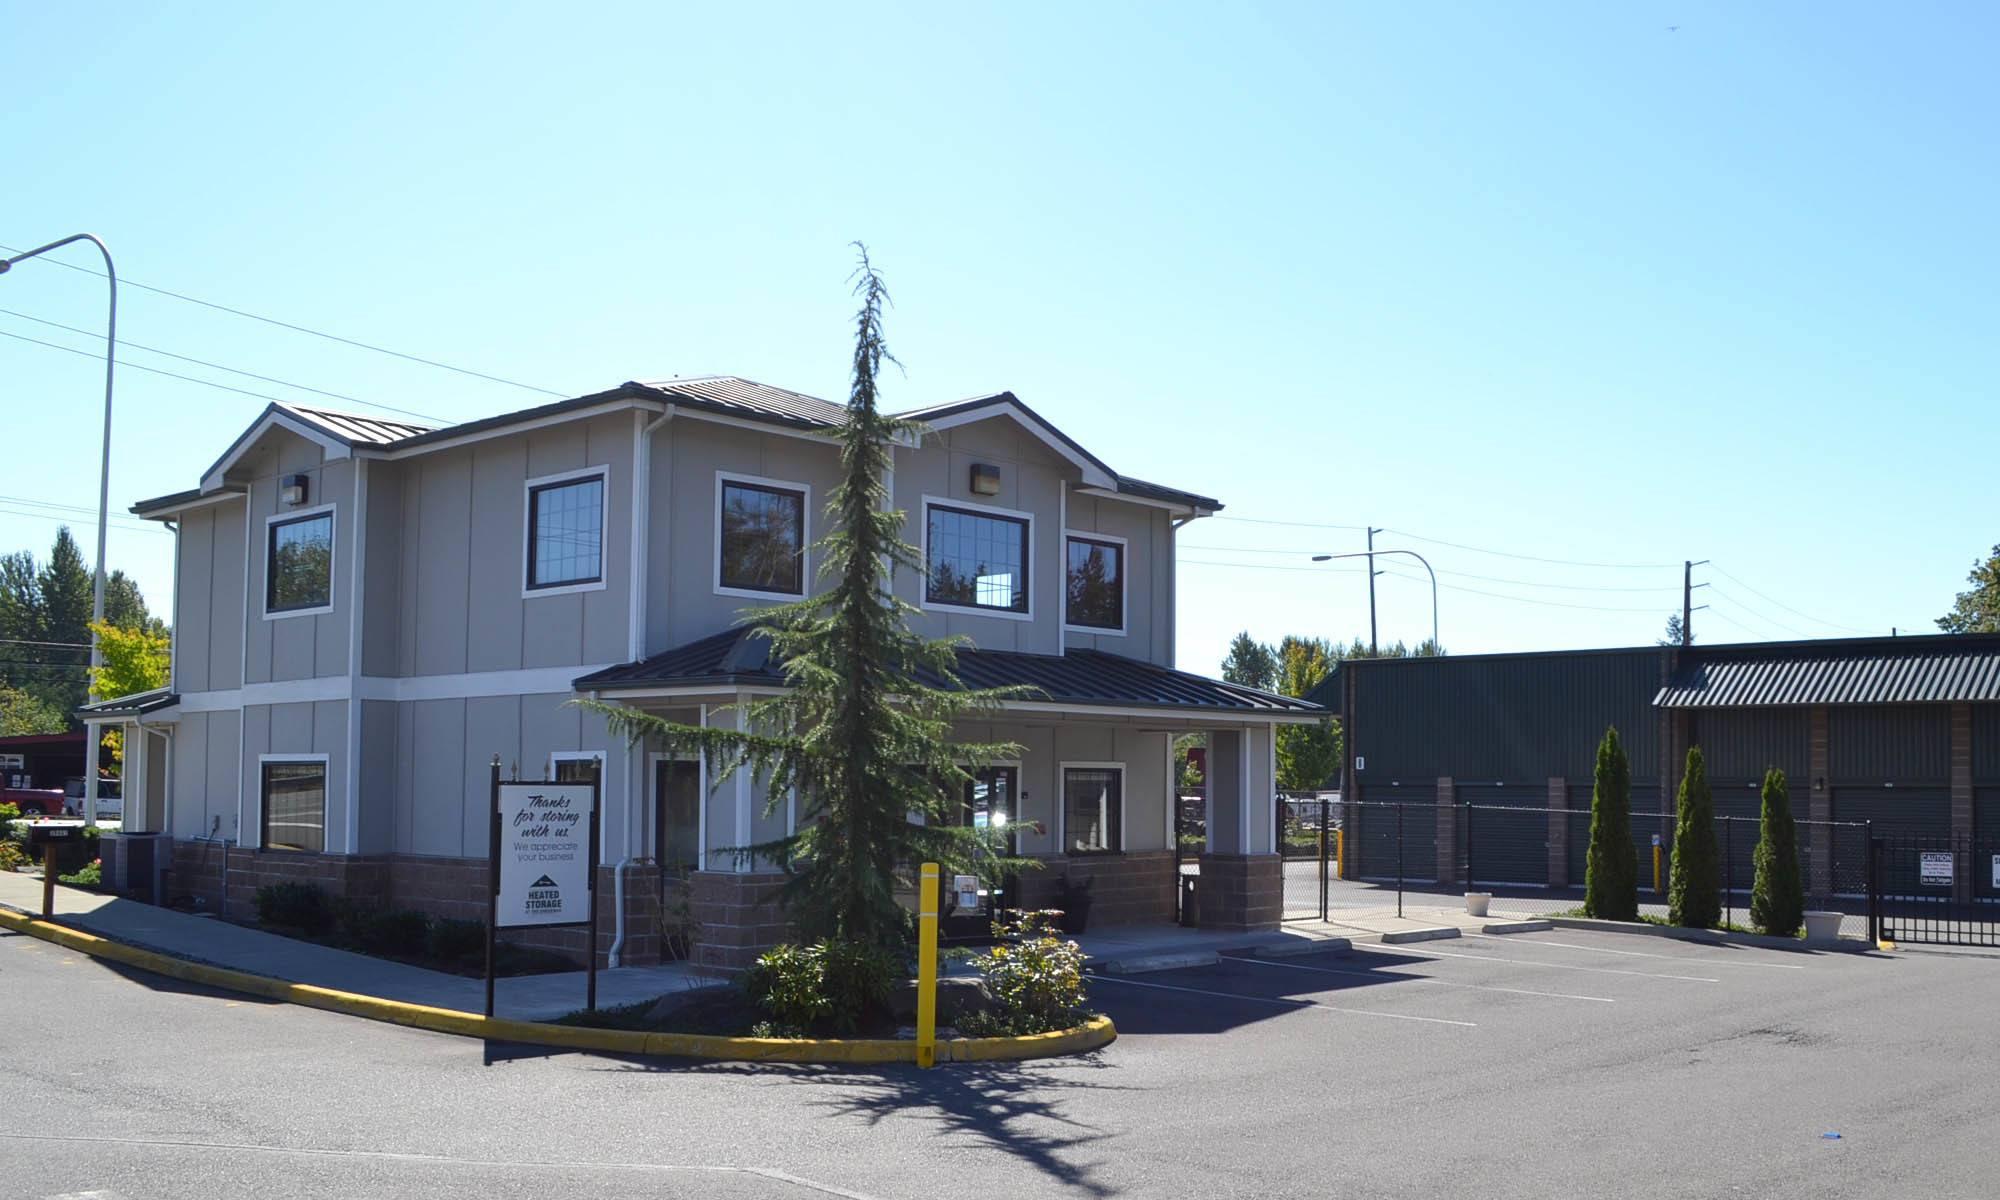 Exterior of self storage facility in Federal Way, Washington